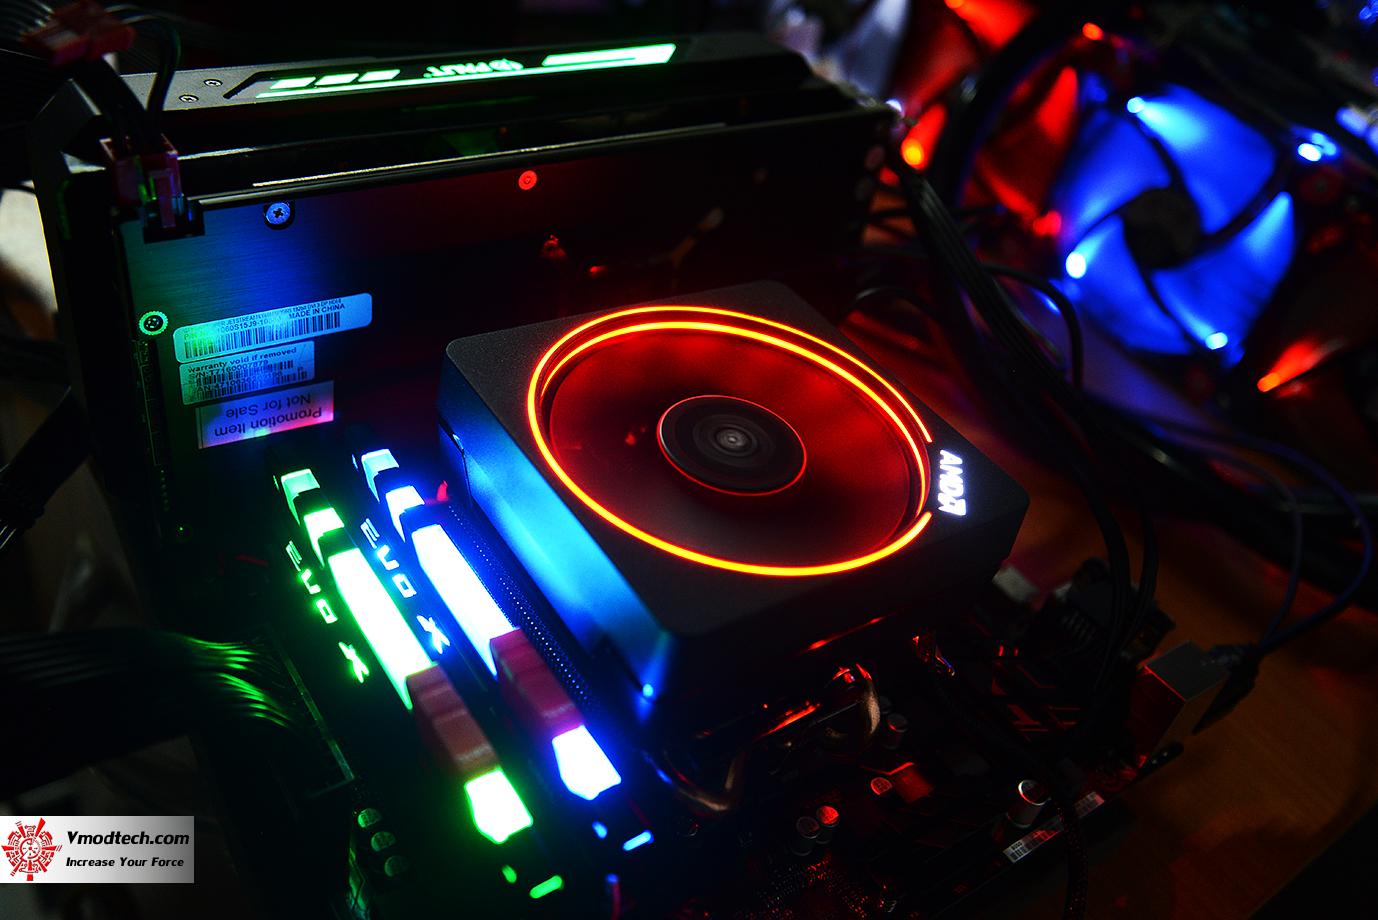 AMD Ryzen Wraith Max RGB Cooler and AMD Wraith Stealth